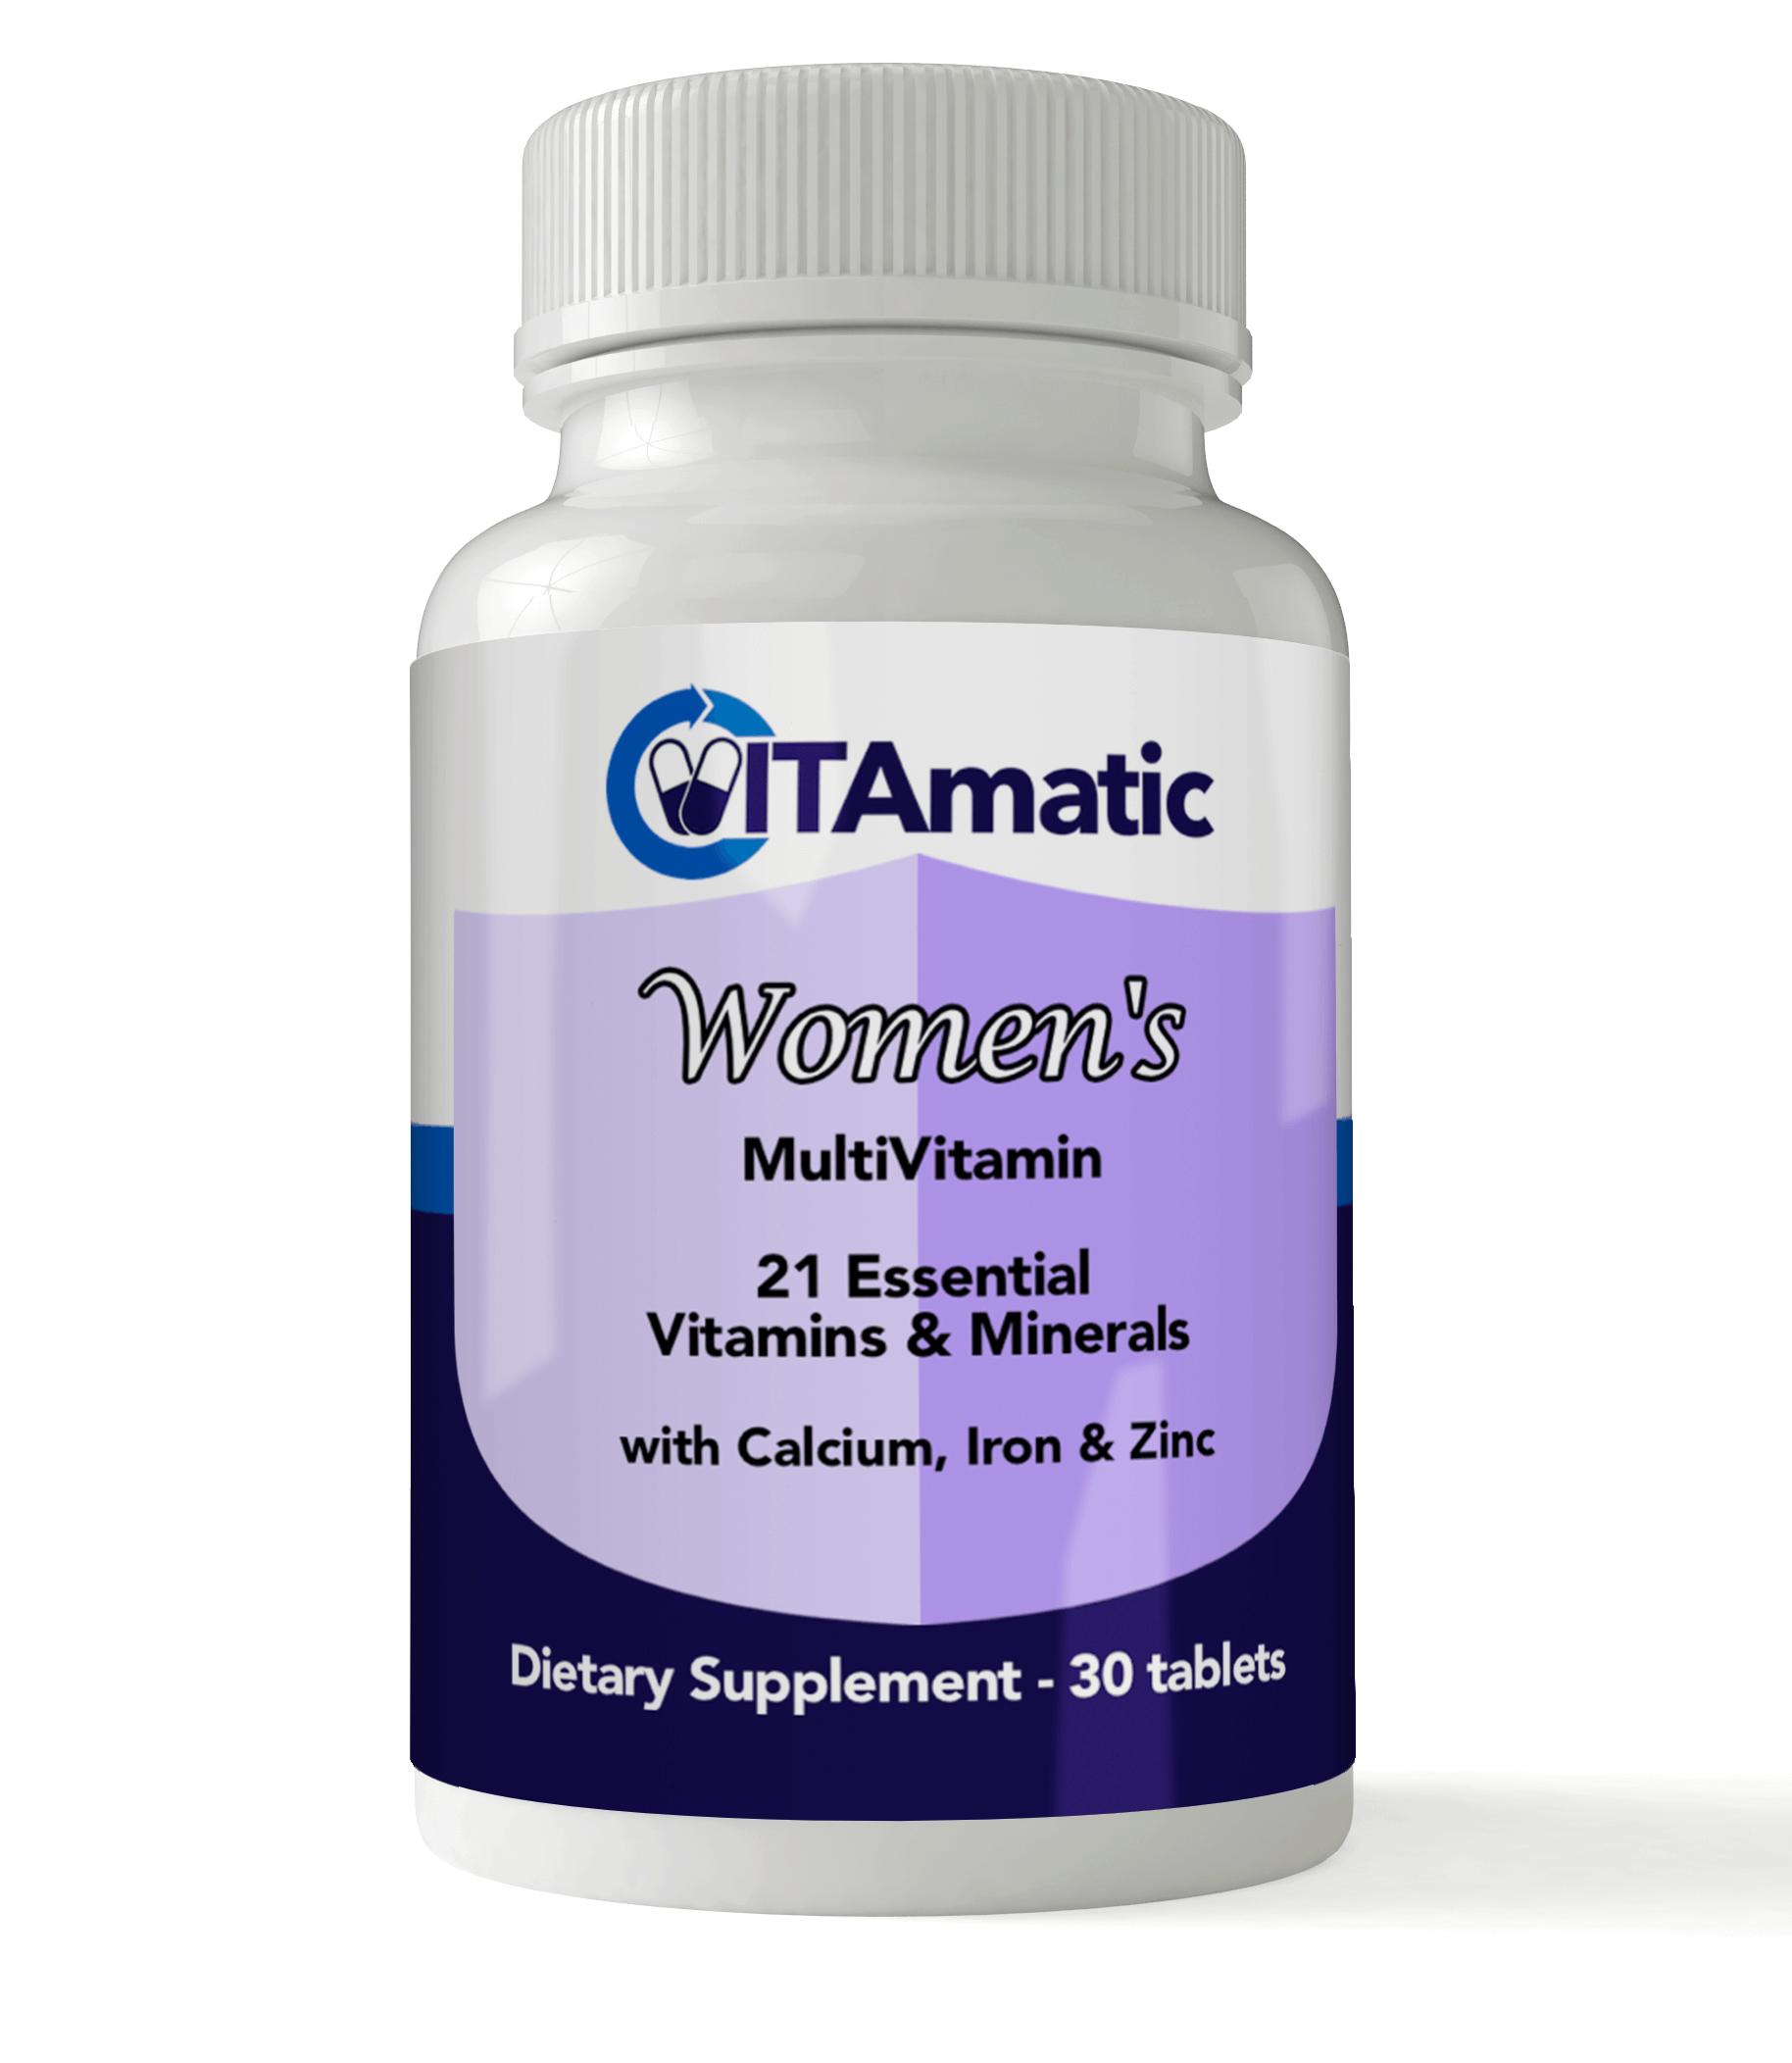 Vitamatic Womens Multivitamin